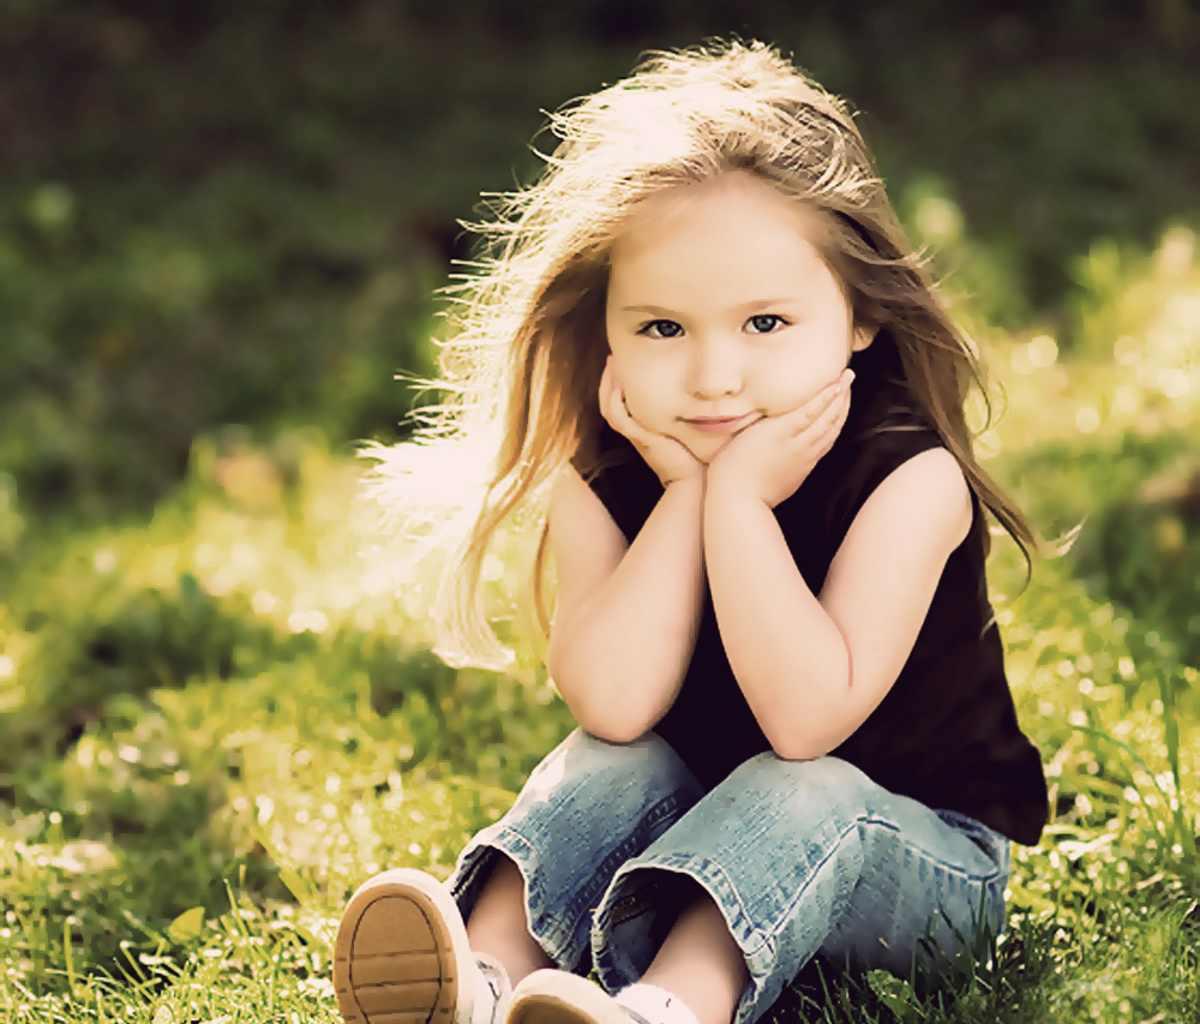 صور أطفال بنات